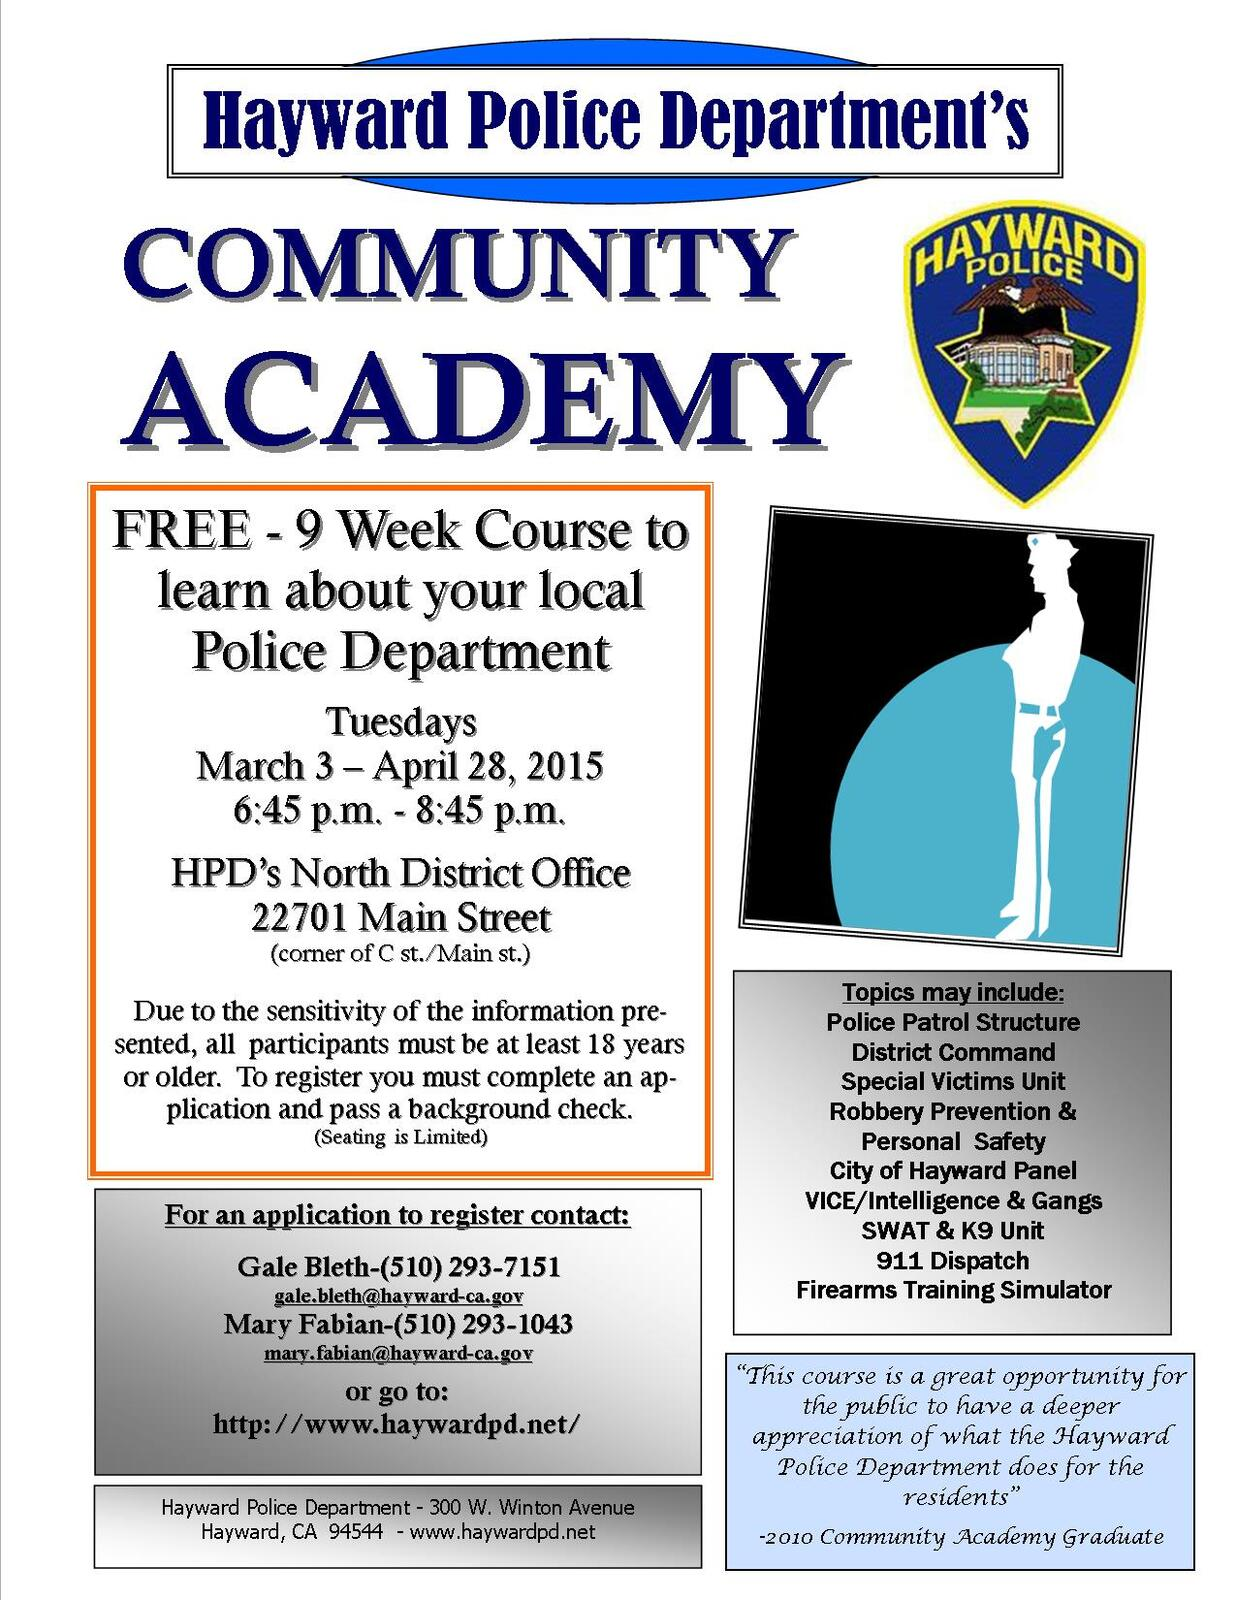 COMMUNITY ACADEMY - Hayward Police Department (Hayward